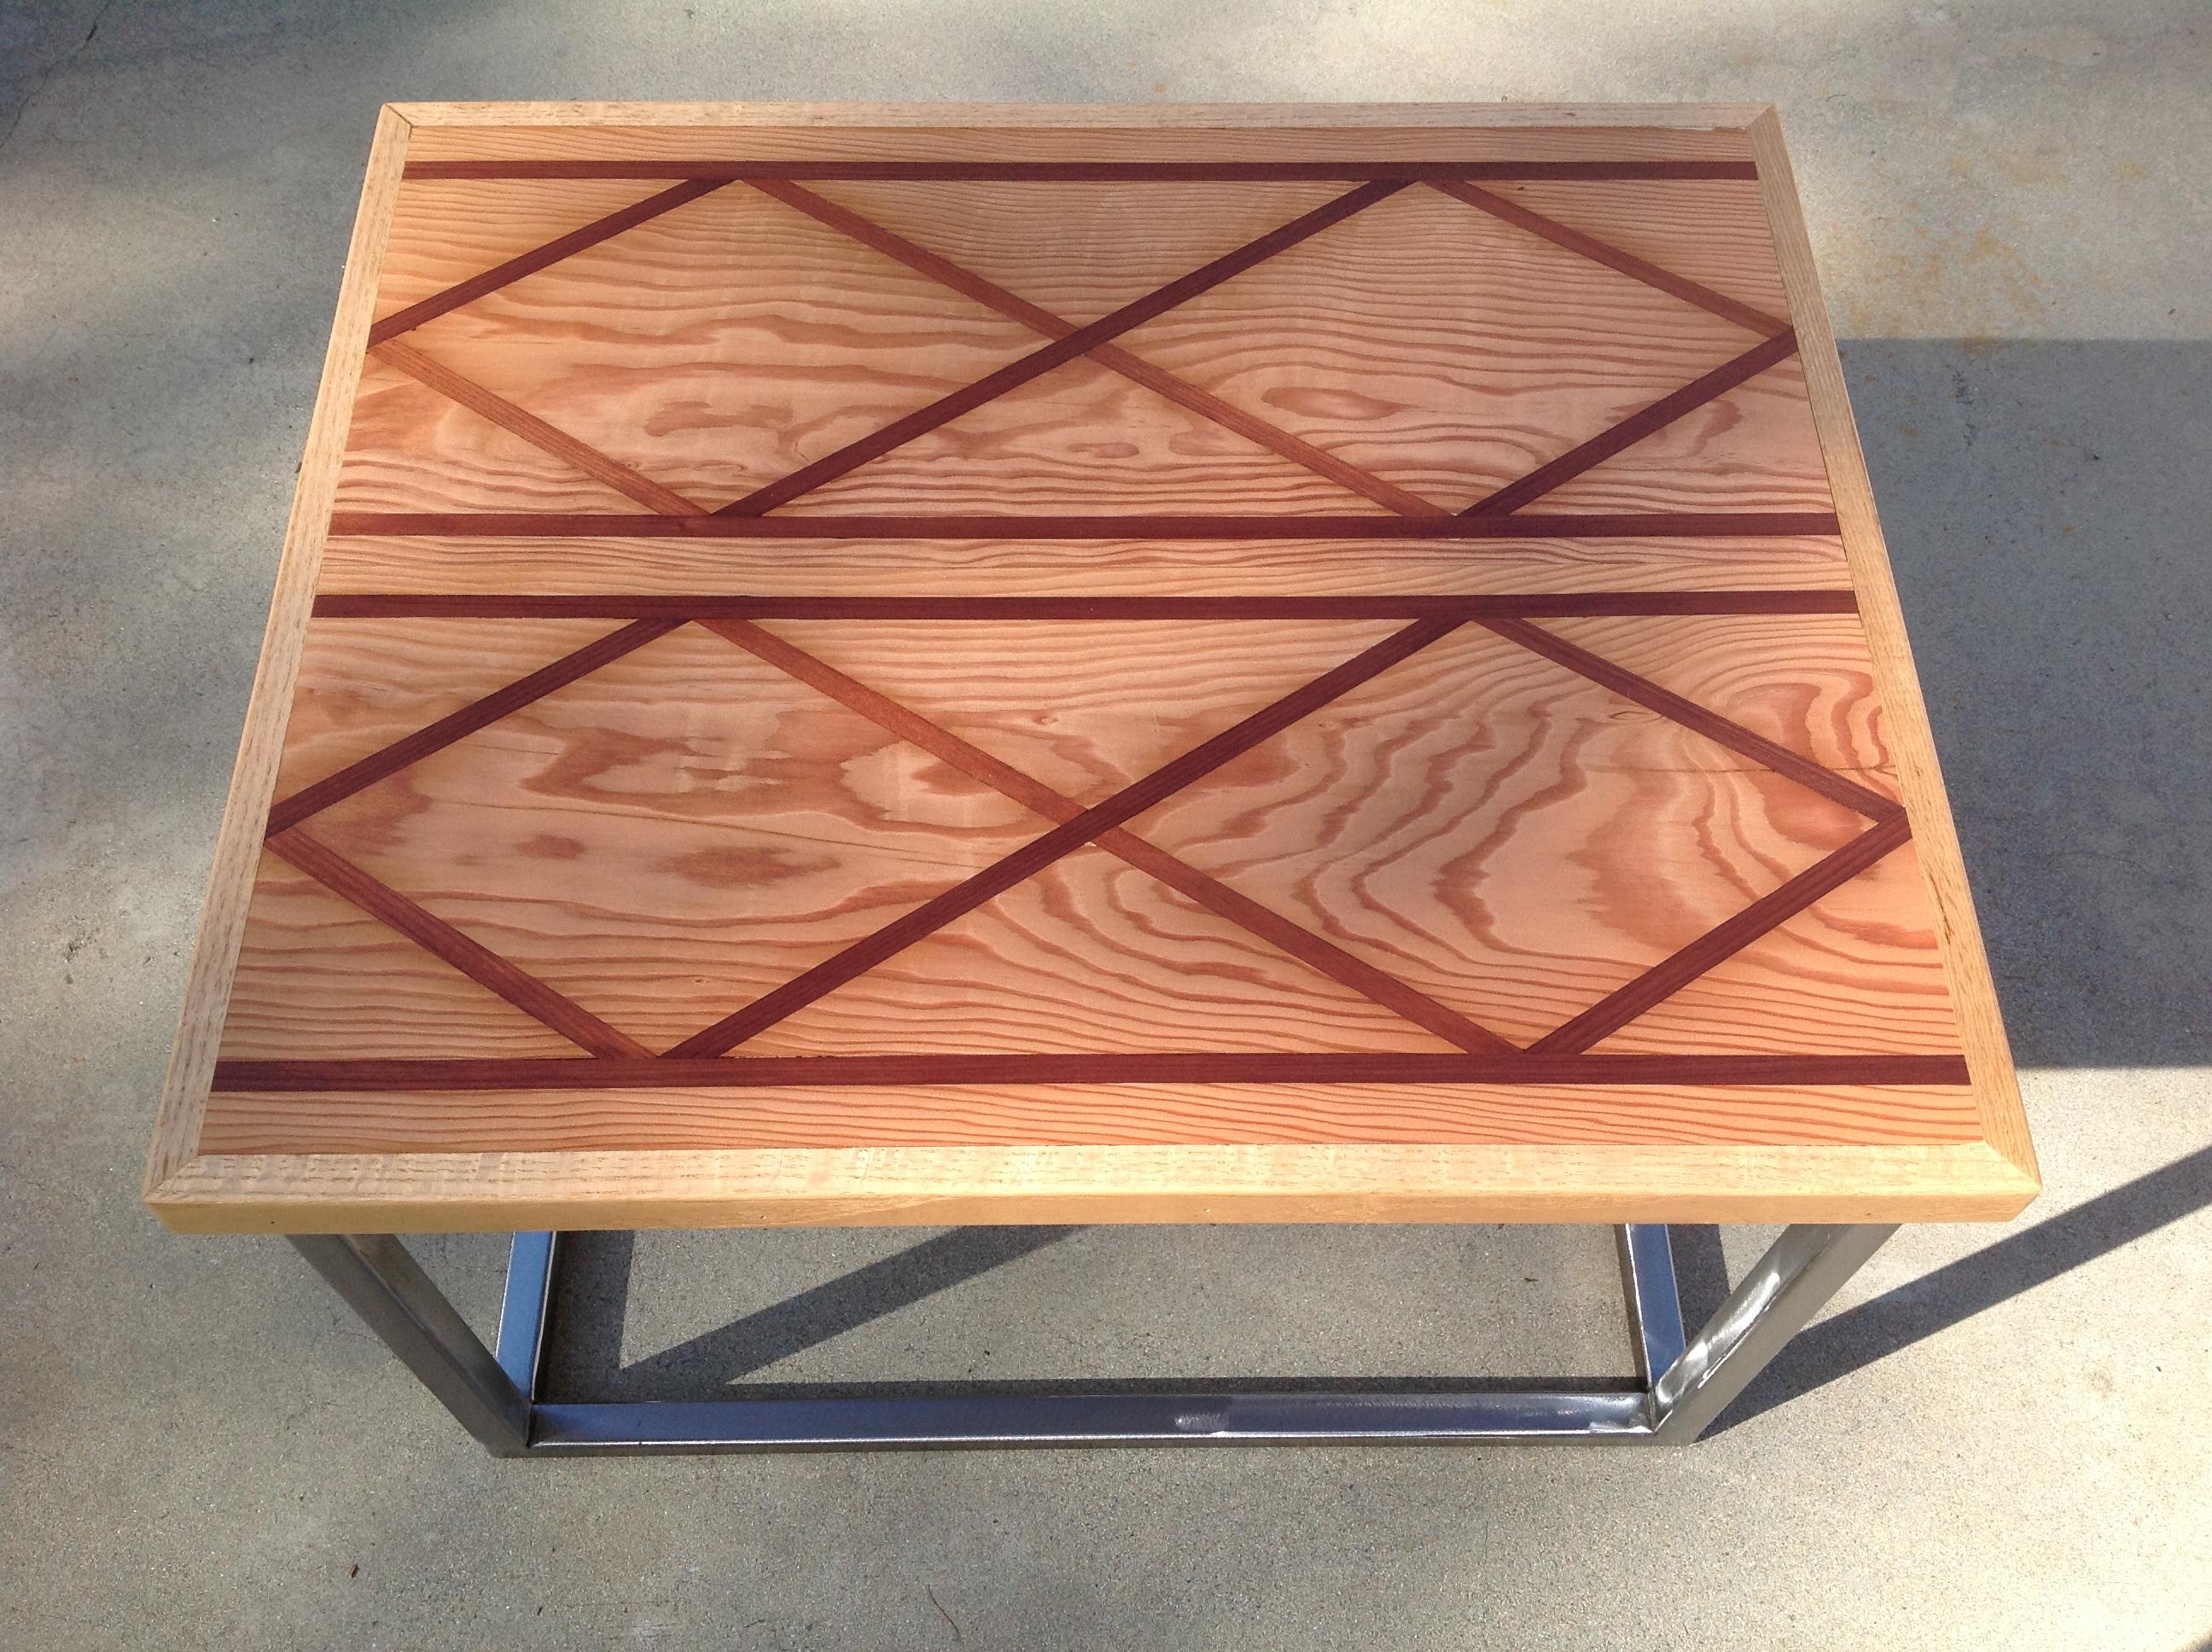 Wood Inlay Top Table Designs : Pdf diy wood inlay plans free bassinet